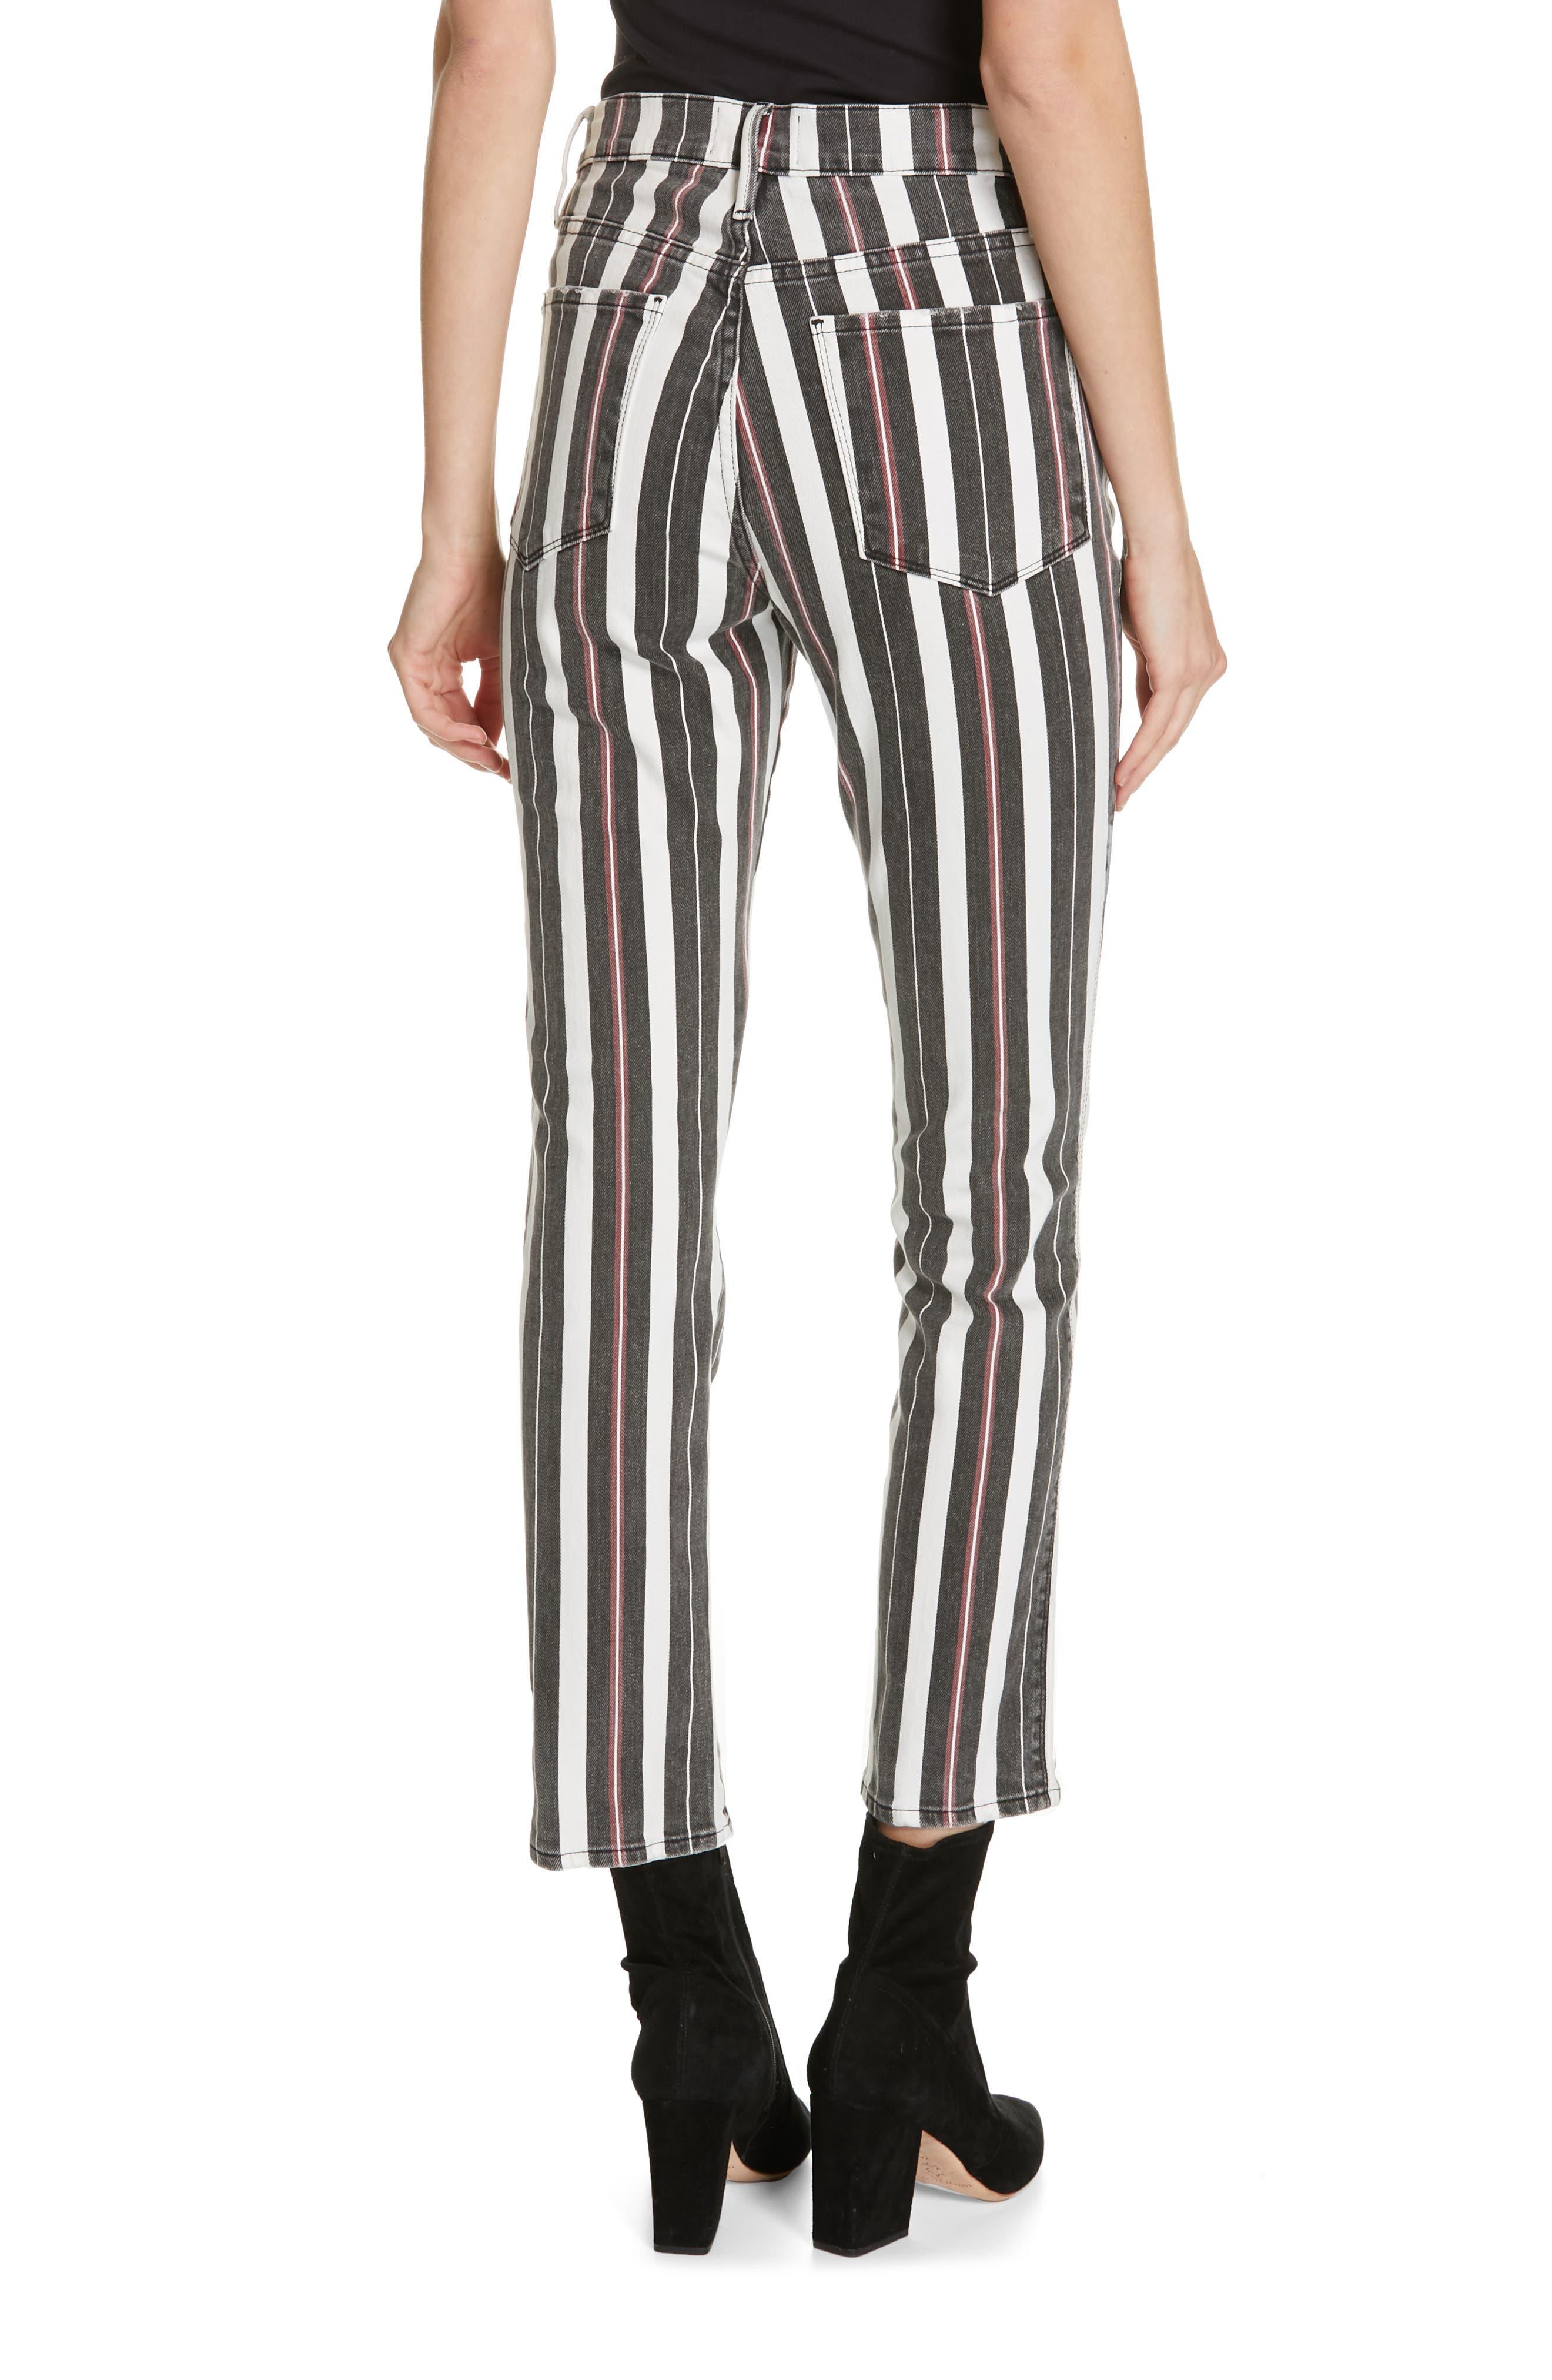 Le Sylvie Band Stripe Straight Leg Jeans,                             Alternate thumbnail 2, color,                             BAND STRIPE